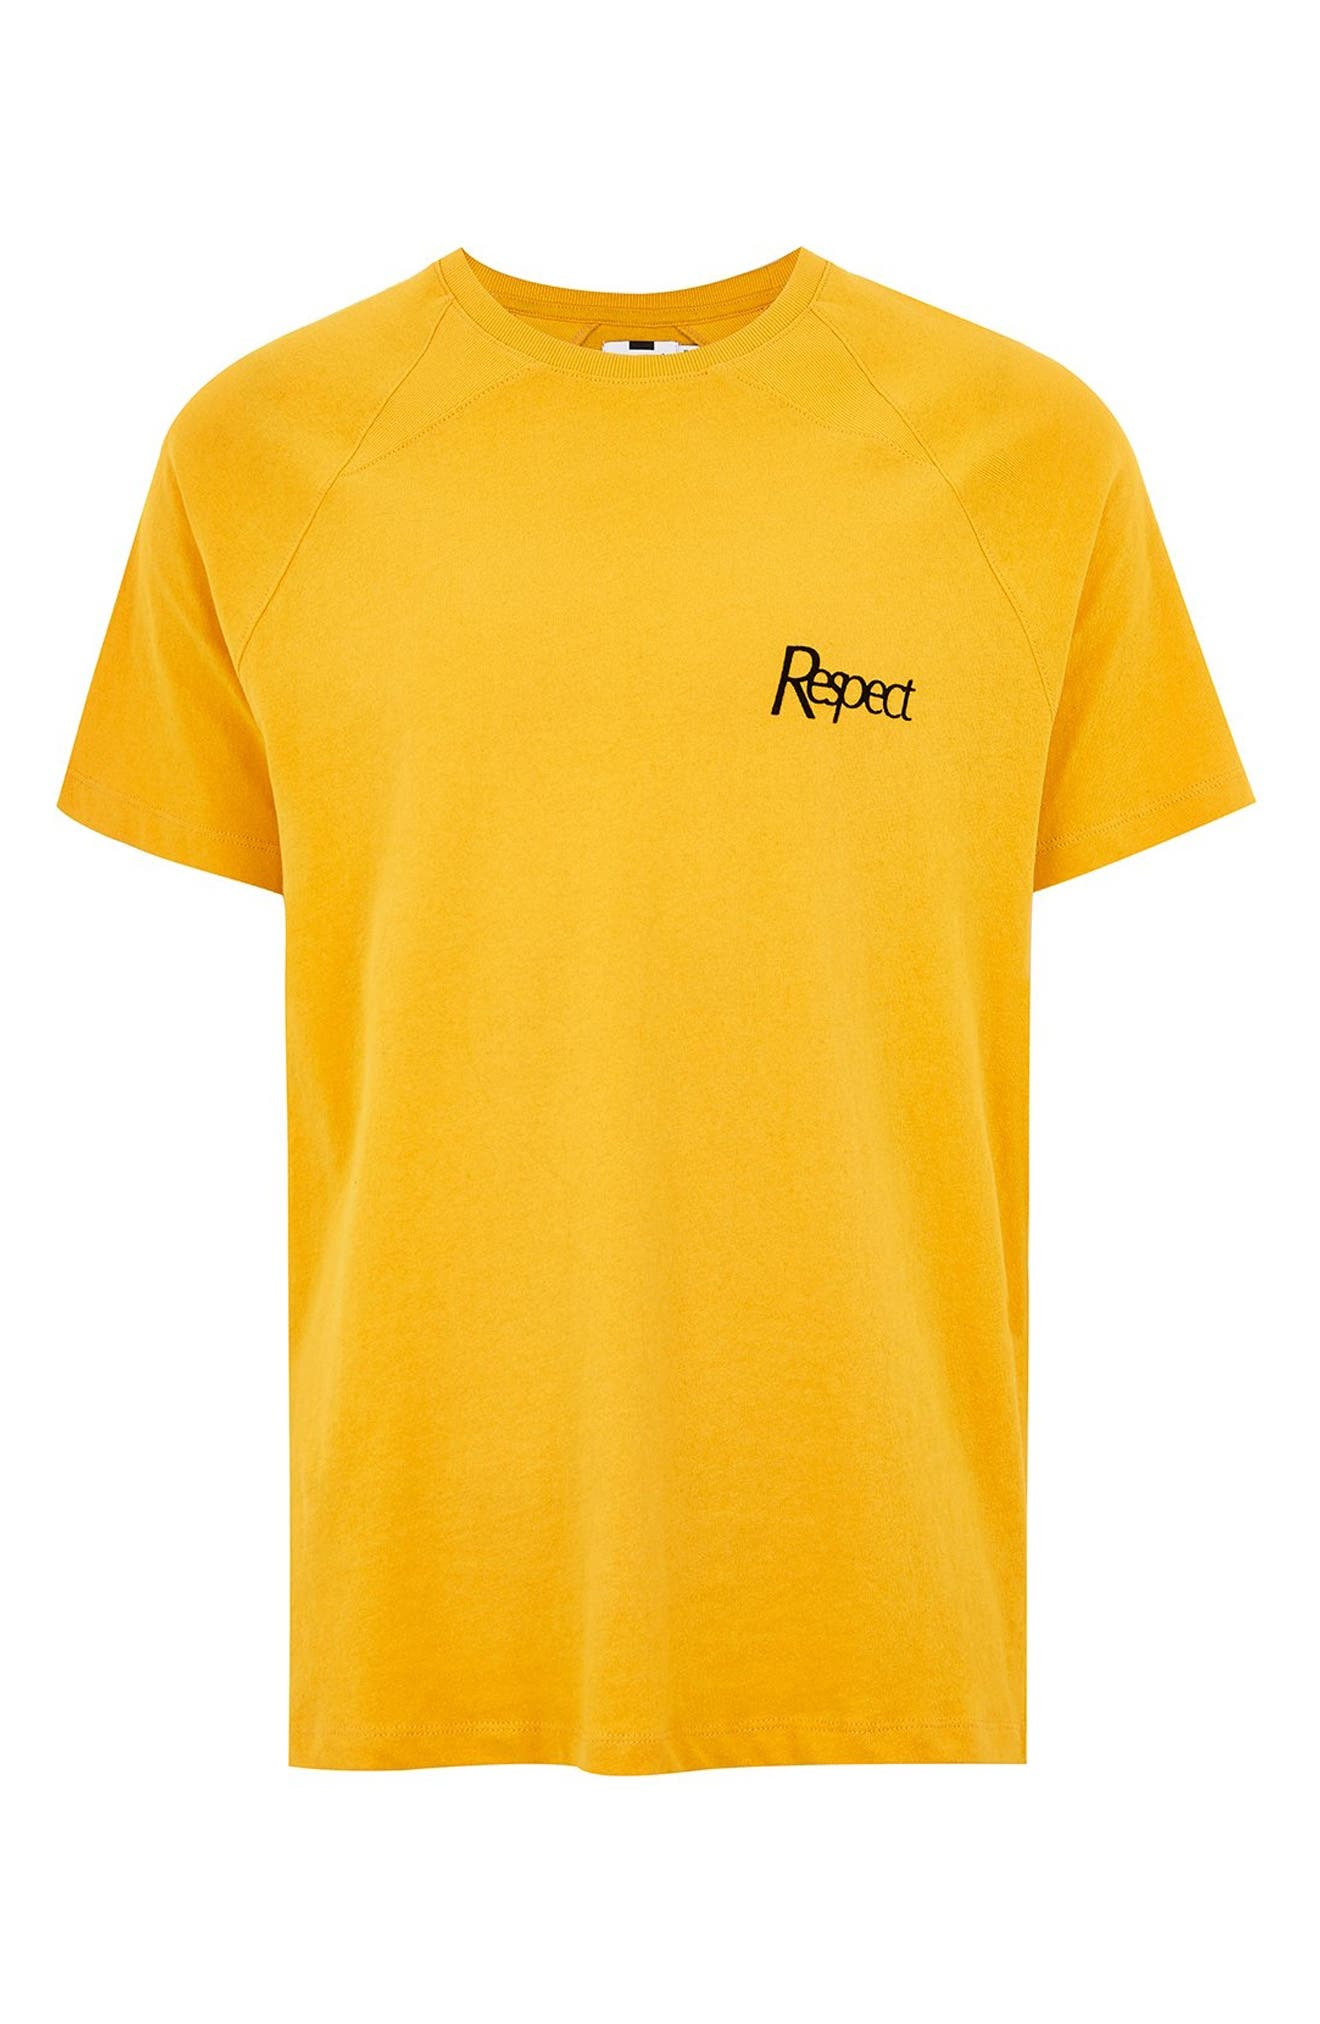 Respect Classic Fit T-Shirt,                             Alternate thumbnail 4, color,                             710